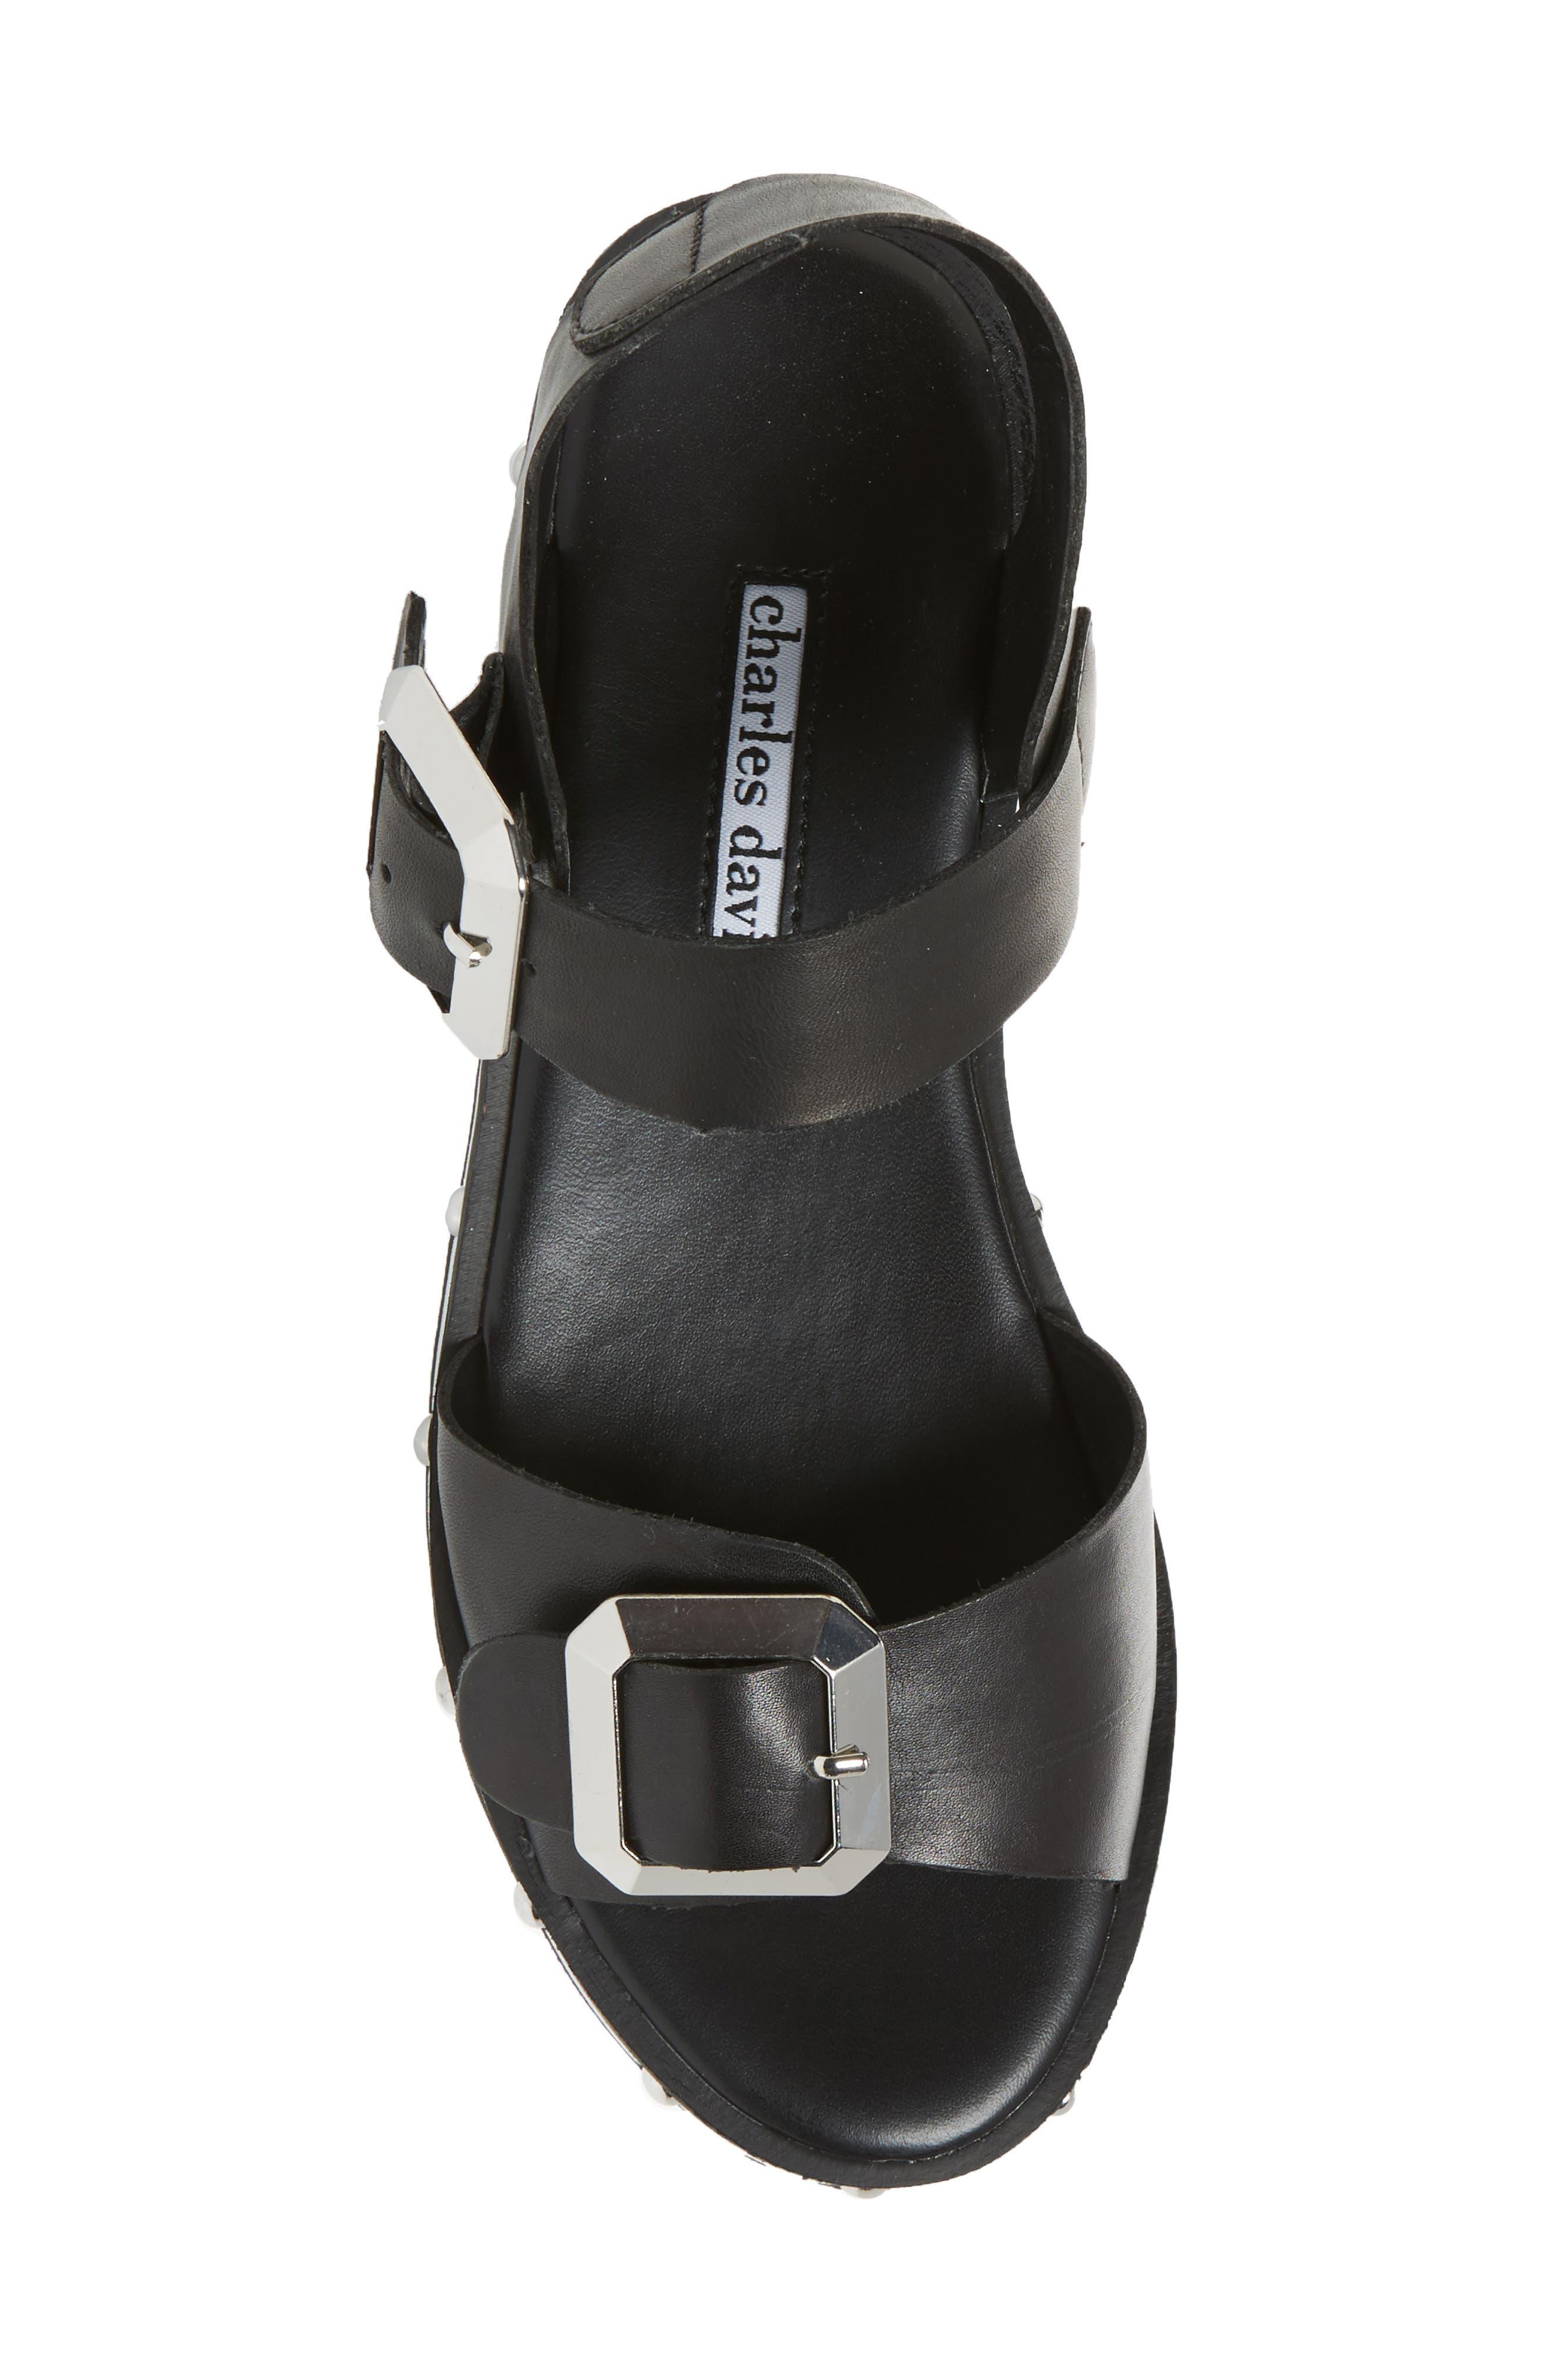 Spy Sandal,                             Alternate thumbnail 5, color,                             Black Leather